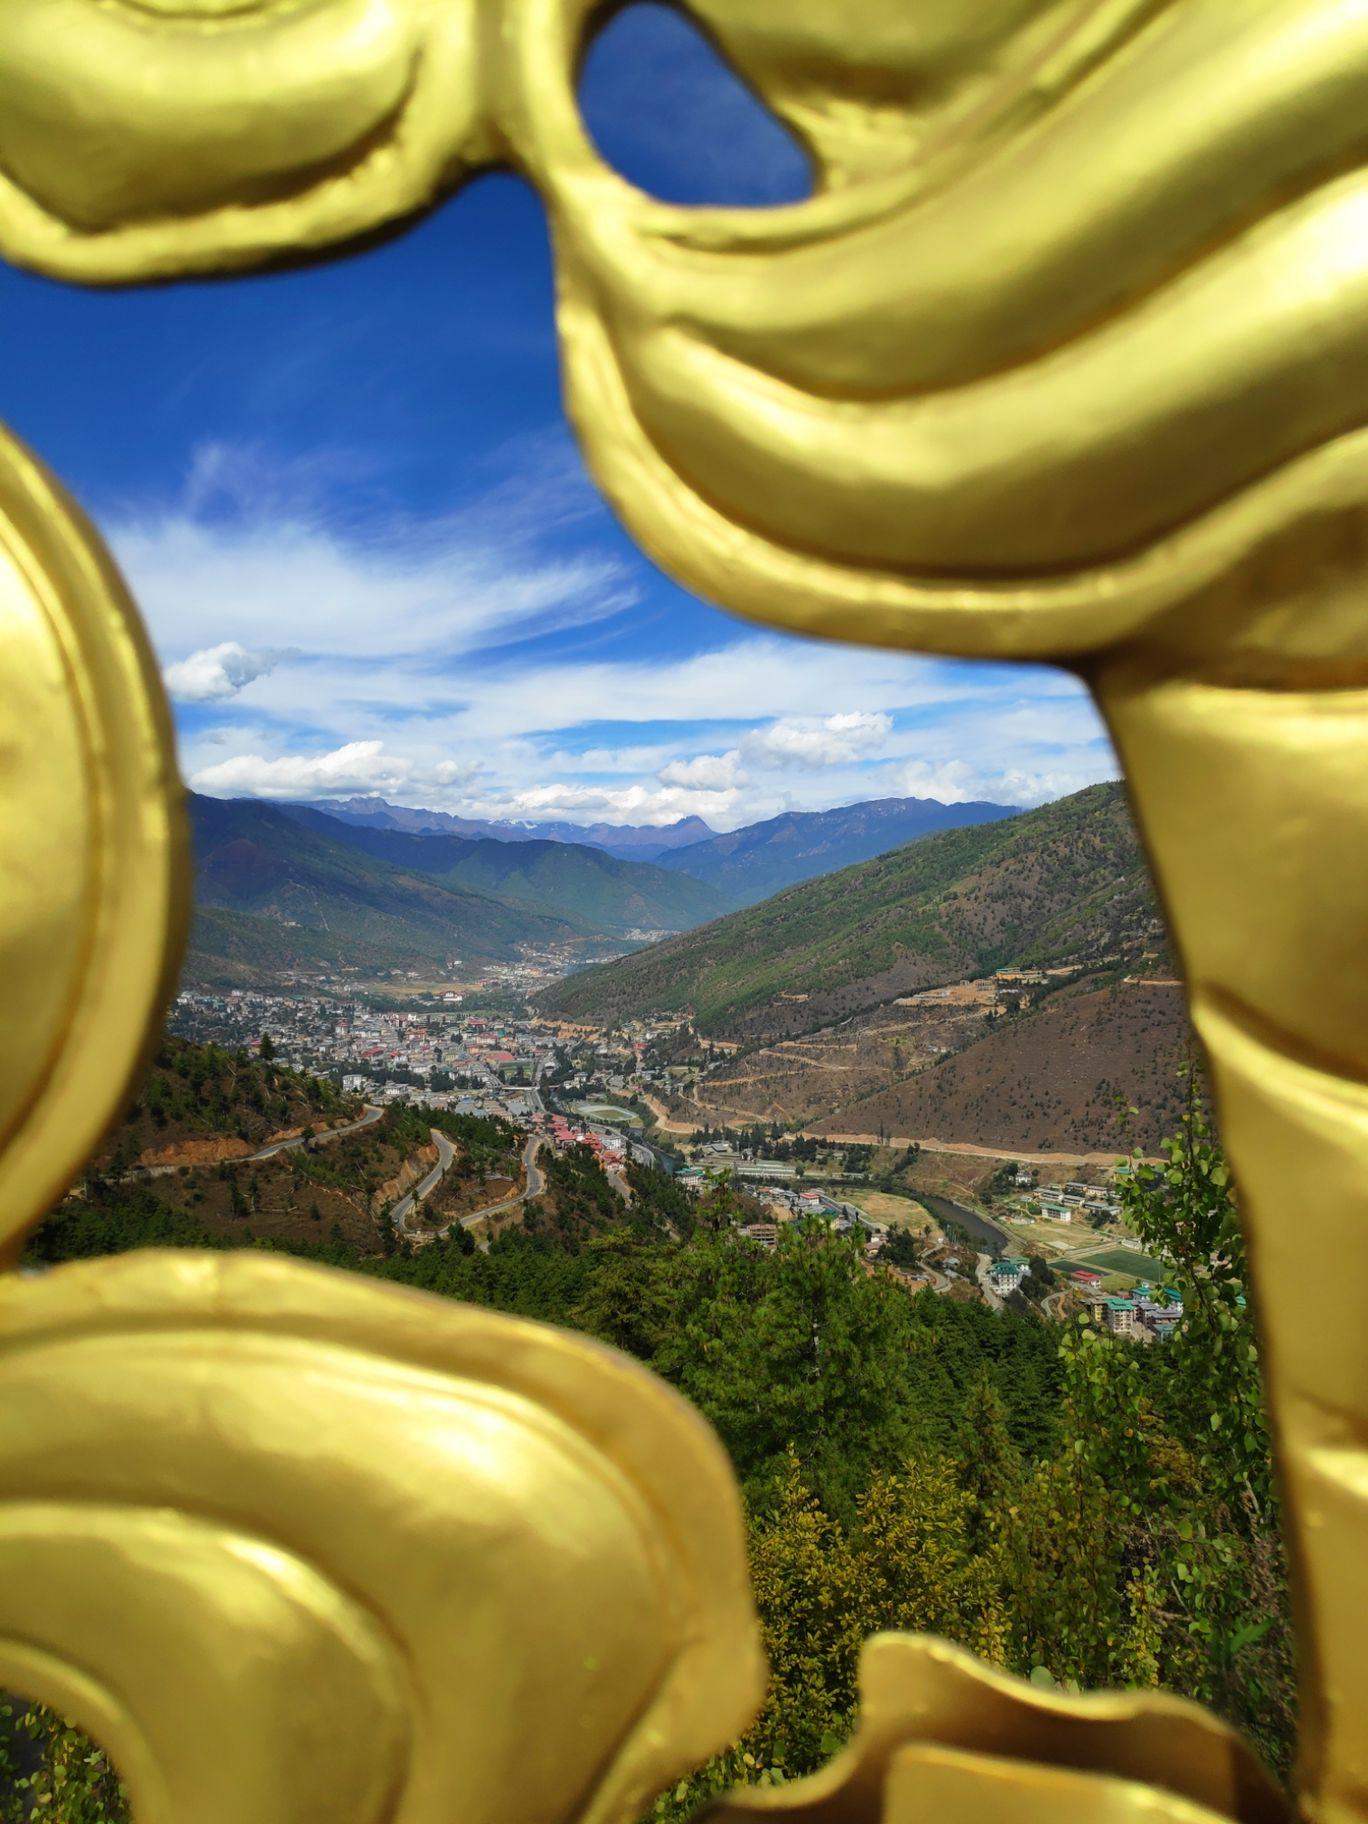 Photo of Bhutan By Sandeep Sreedhar